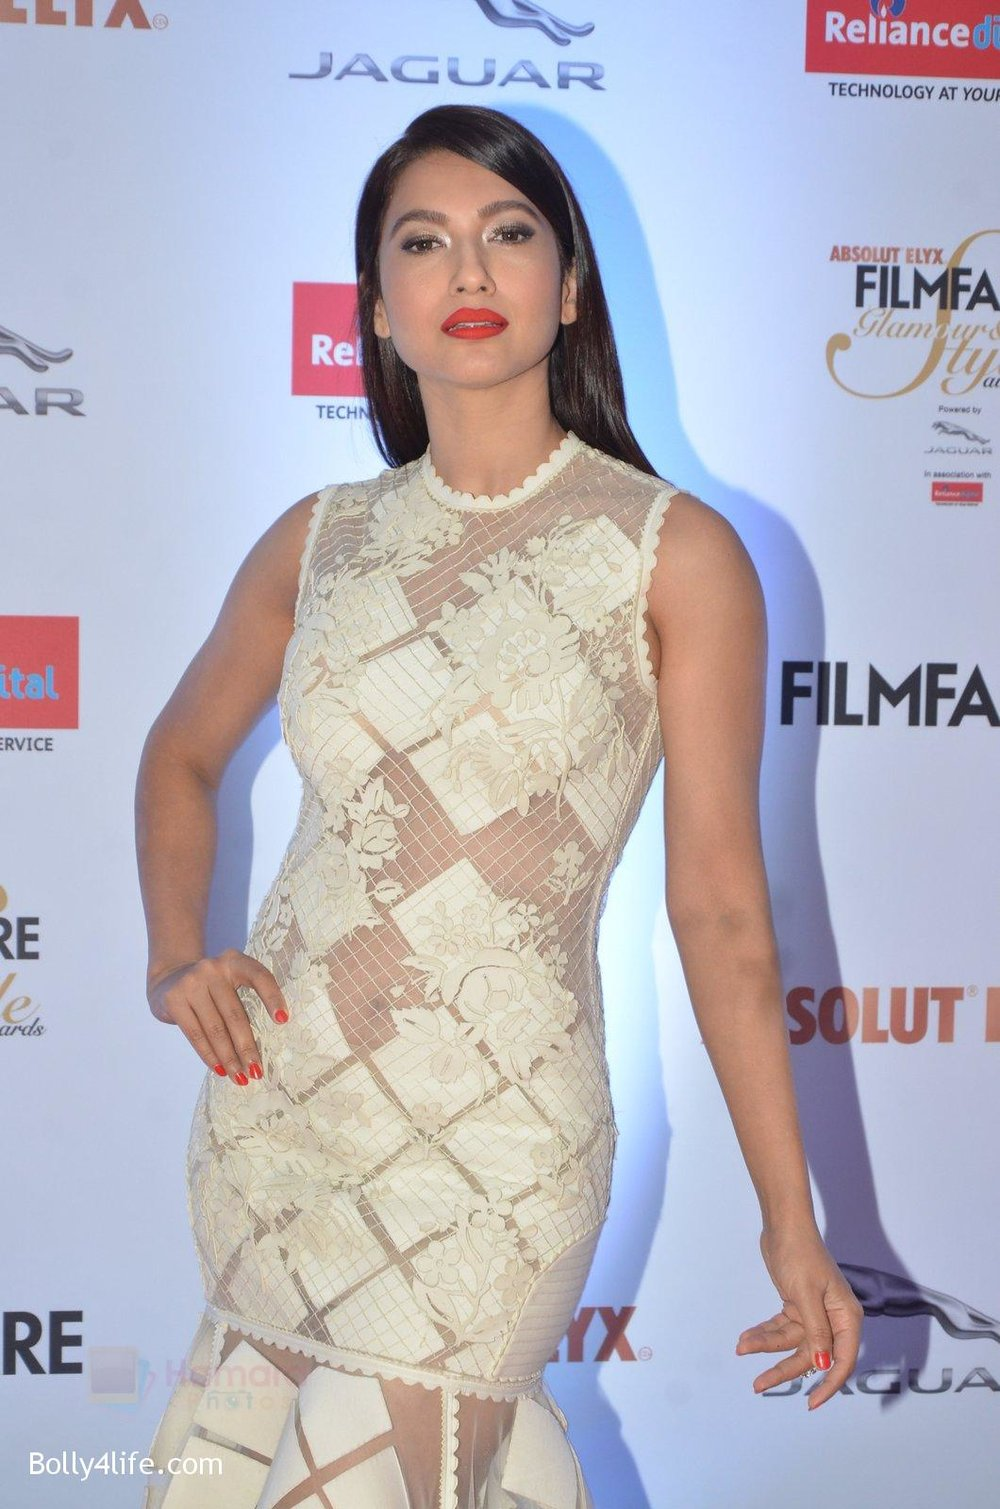 Gauhar-Khan-at-Filmfare-Glamour-Style-Awards-2016-in-Mumbai-on-15th-Oct-2016-1139.jpg